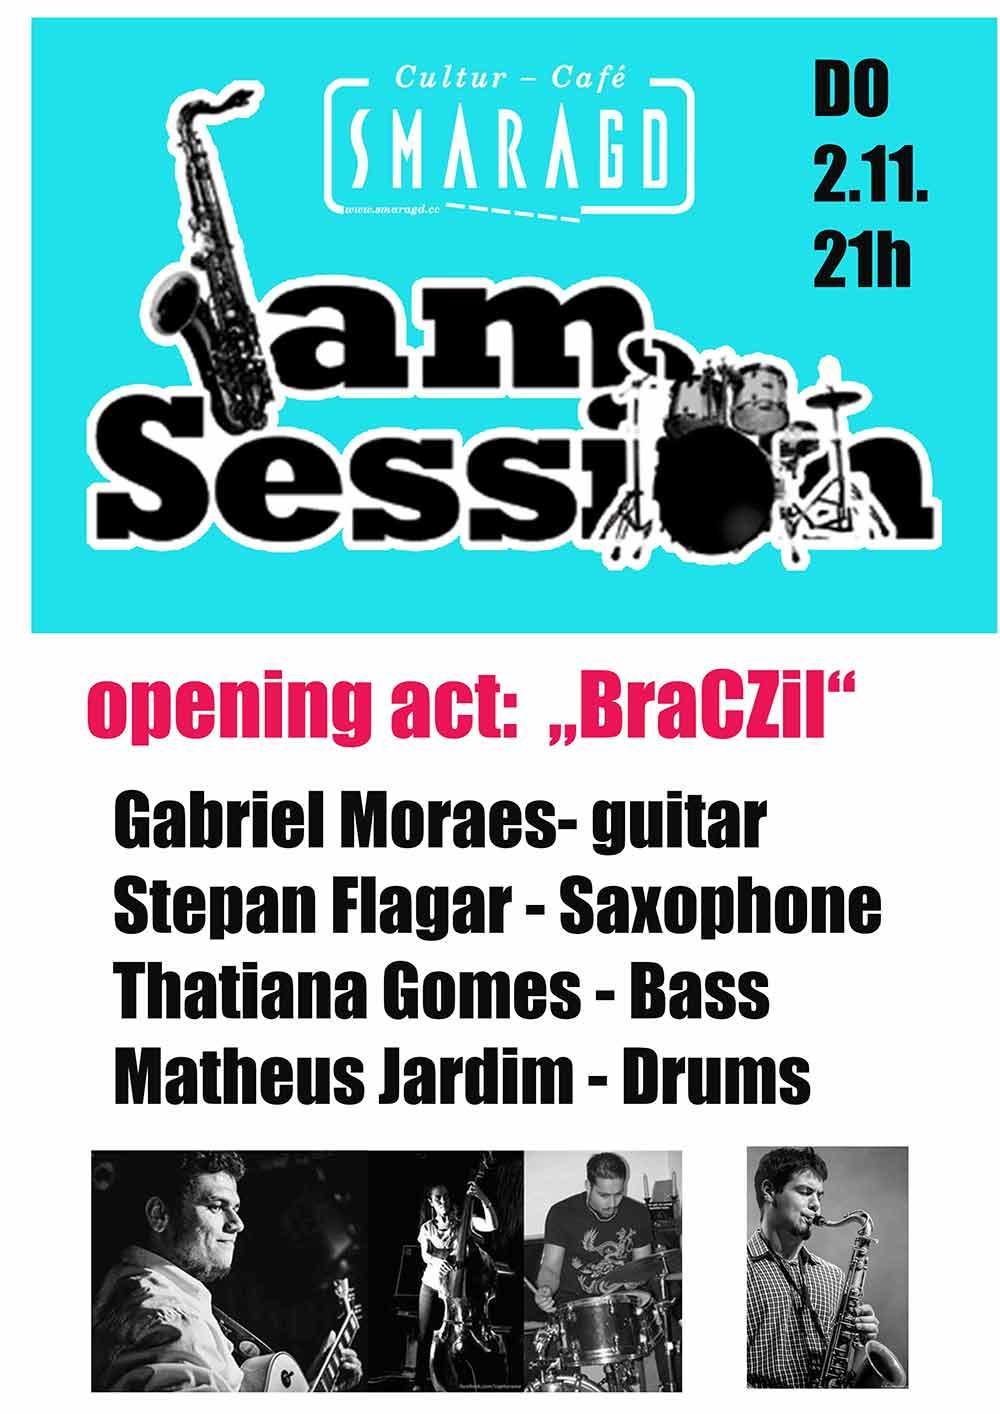 ccsmaragd-linz-jamsession-braczil-1